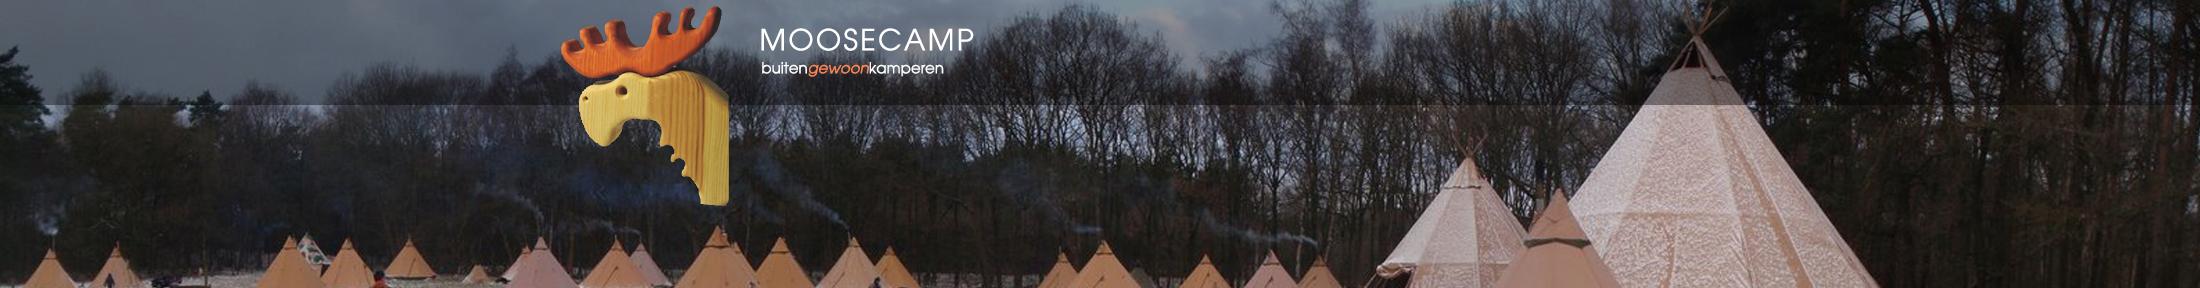 Moosecamp webshop Vervolgpagina's